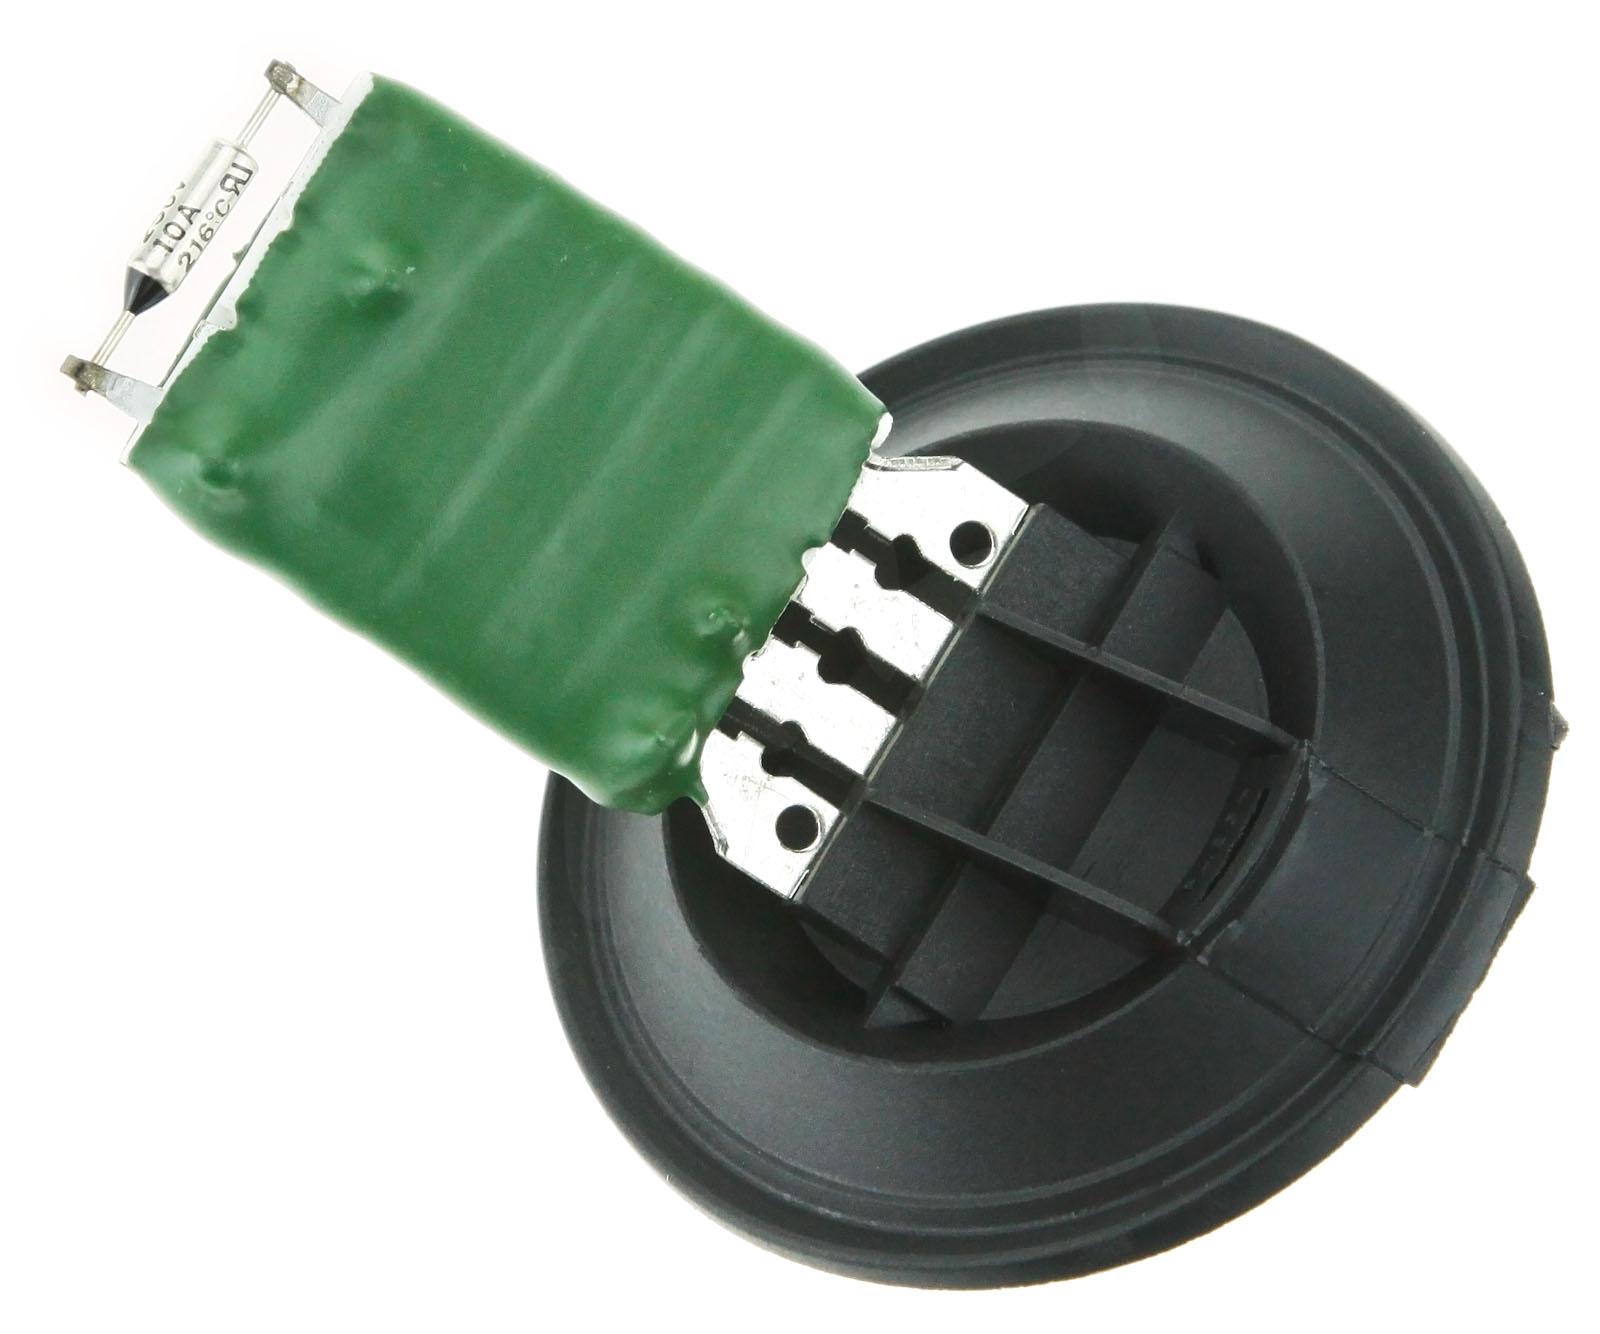 Skoda fabia heater blower resistor